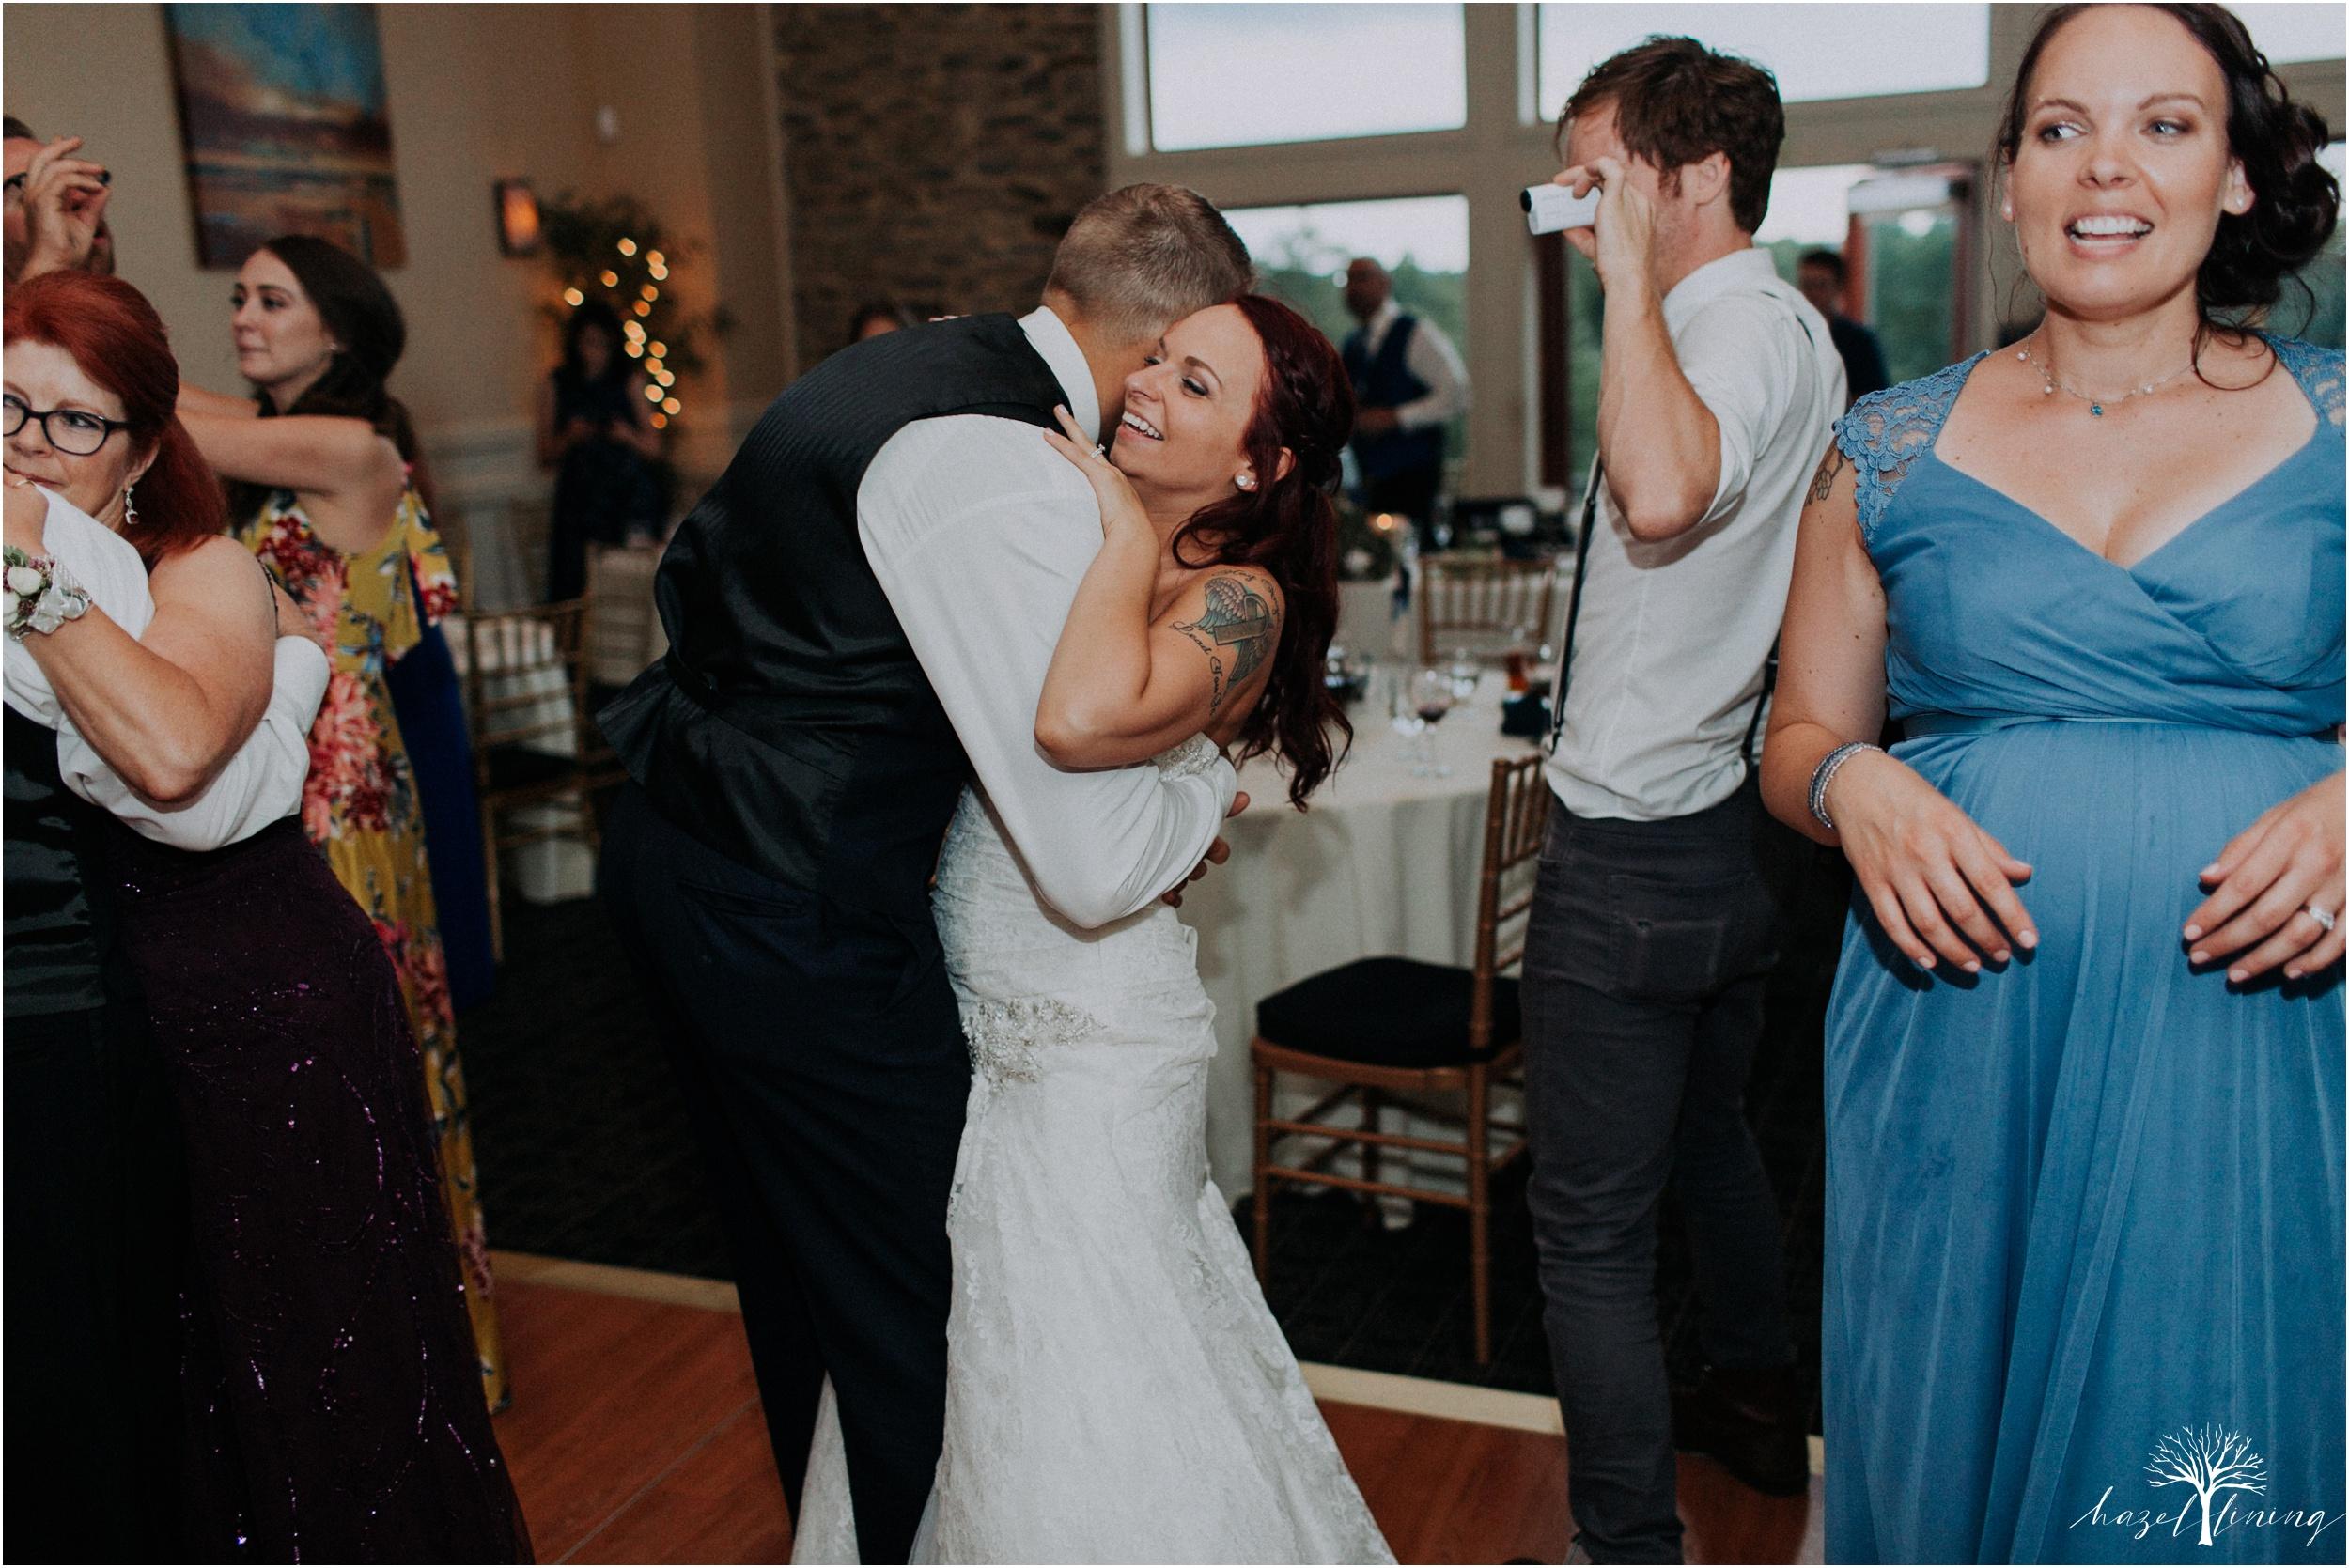 alyssa-james-stiteler-wedding-loft-and-sweet-water-cc-pennsburg-pennsylvania-hazel-lining-travel-wedding-elopement-photography_0154.jpg